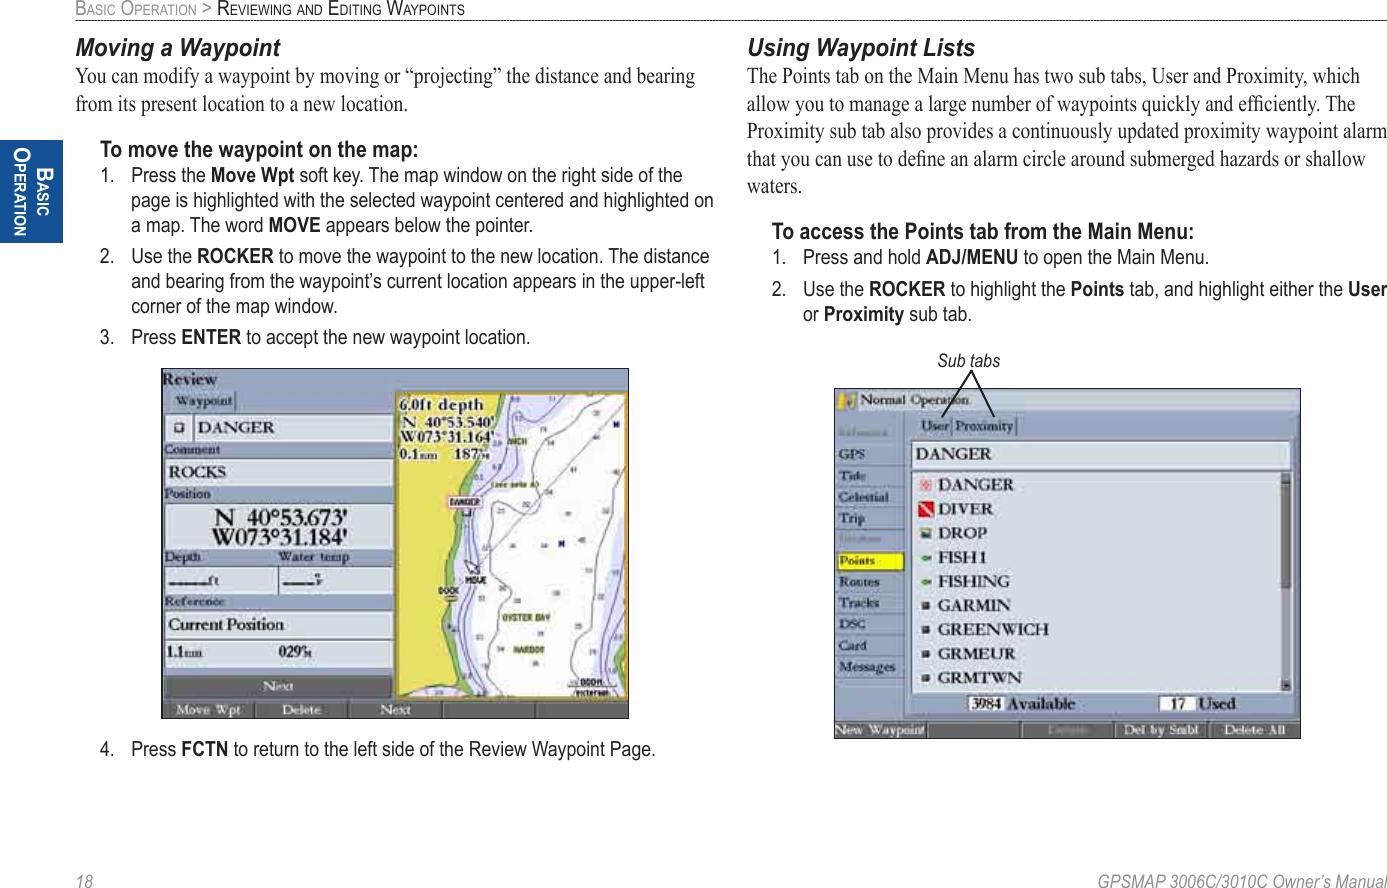 Garmin Gpsmap 3006C 3010C Users Manual